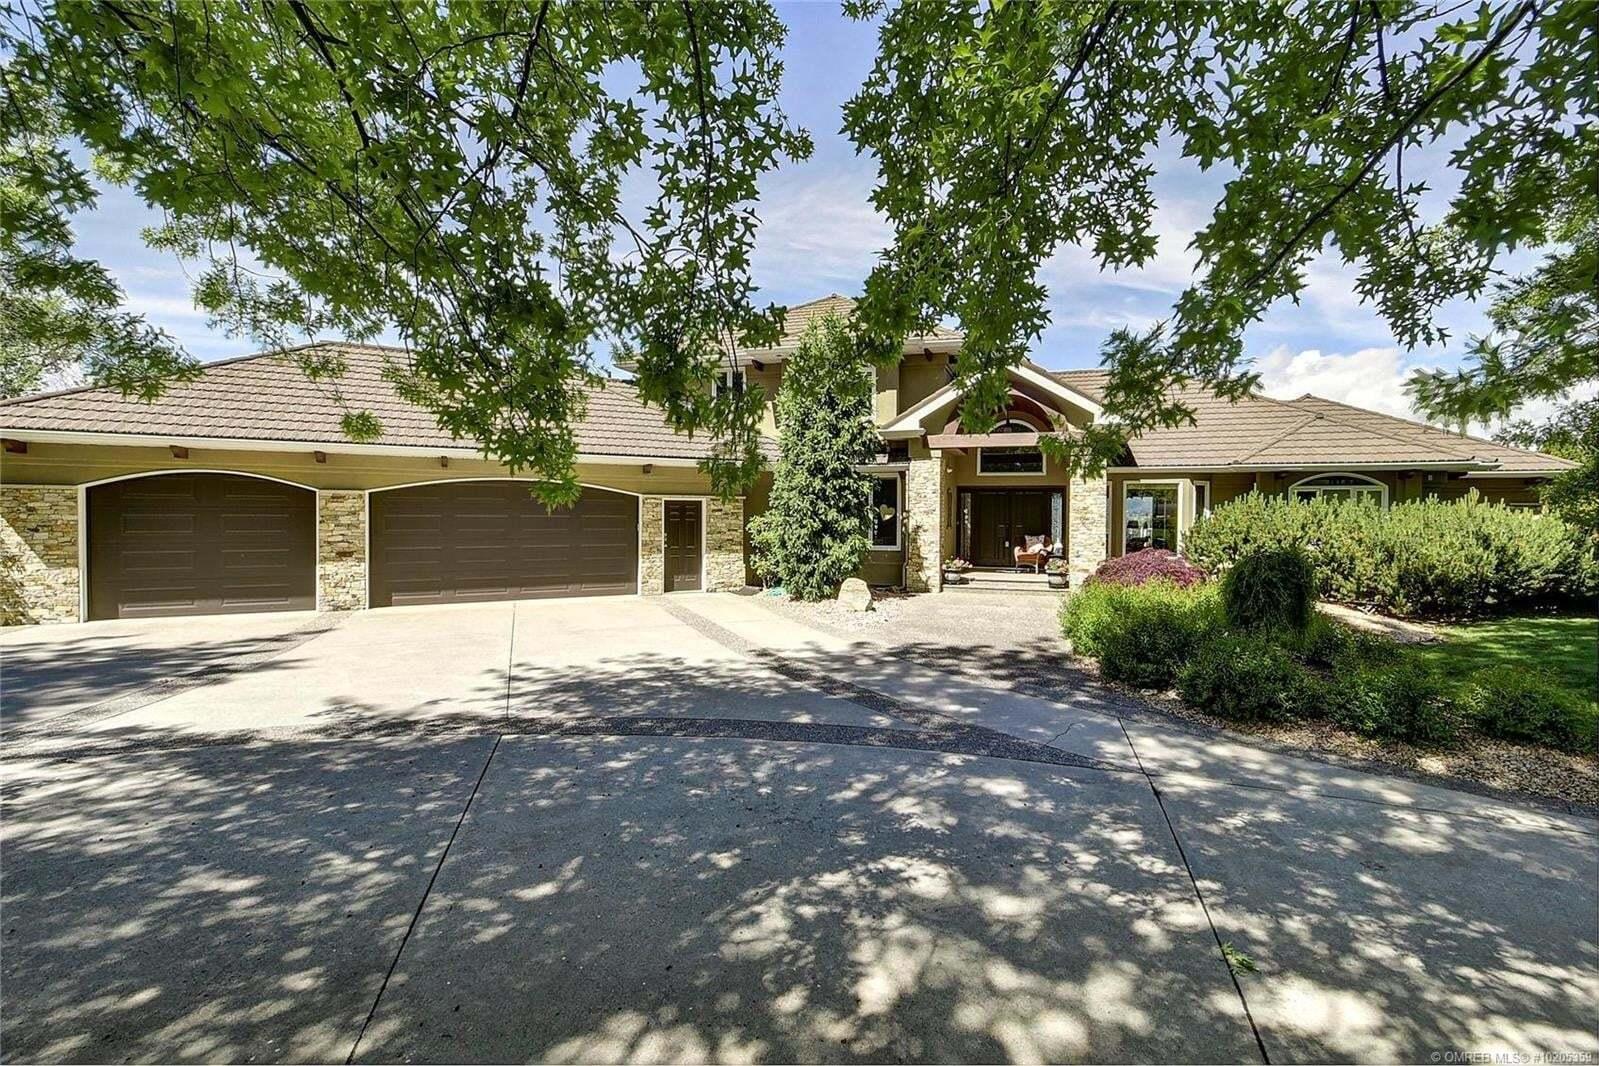 House for sale at 4350 Takla Rd Kelowna British Columbia - MLS: 10205359